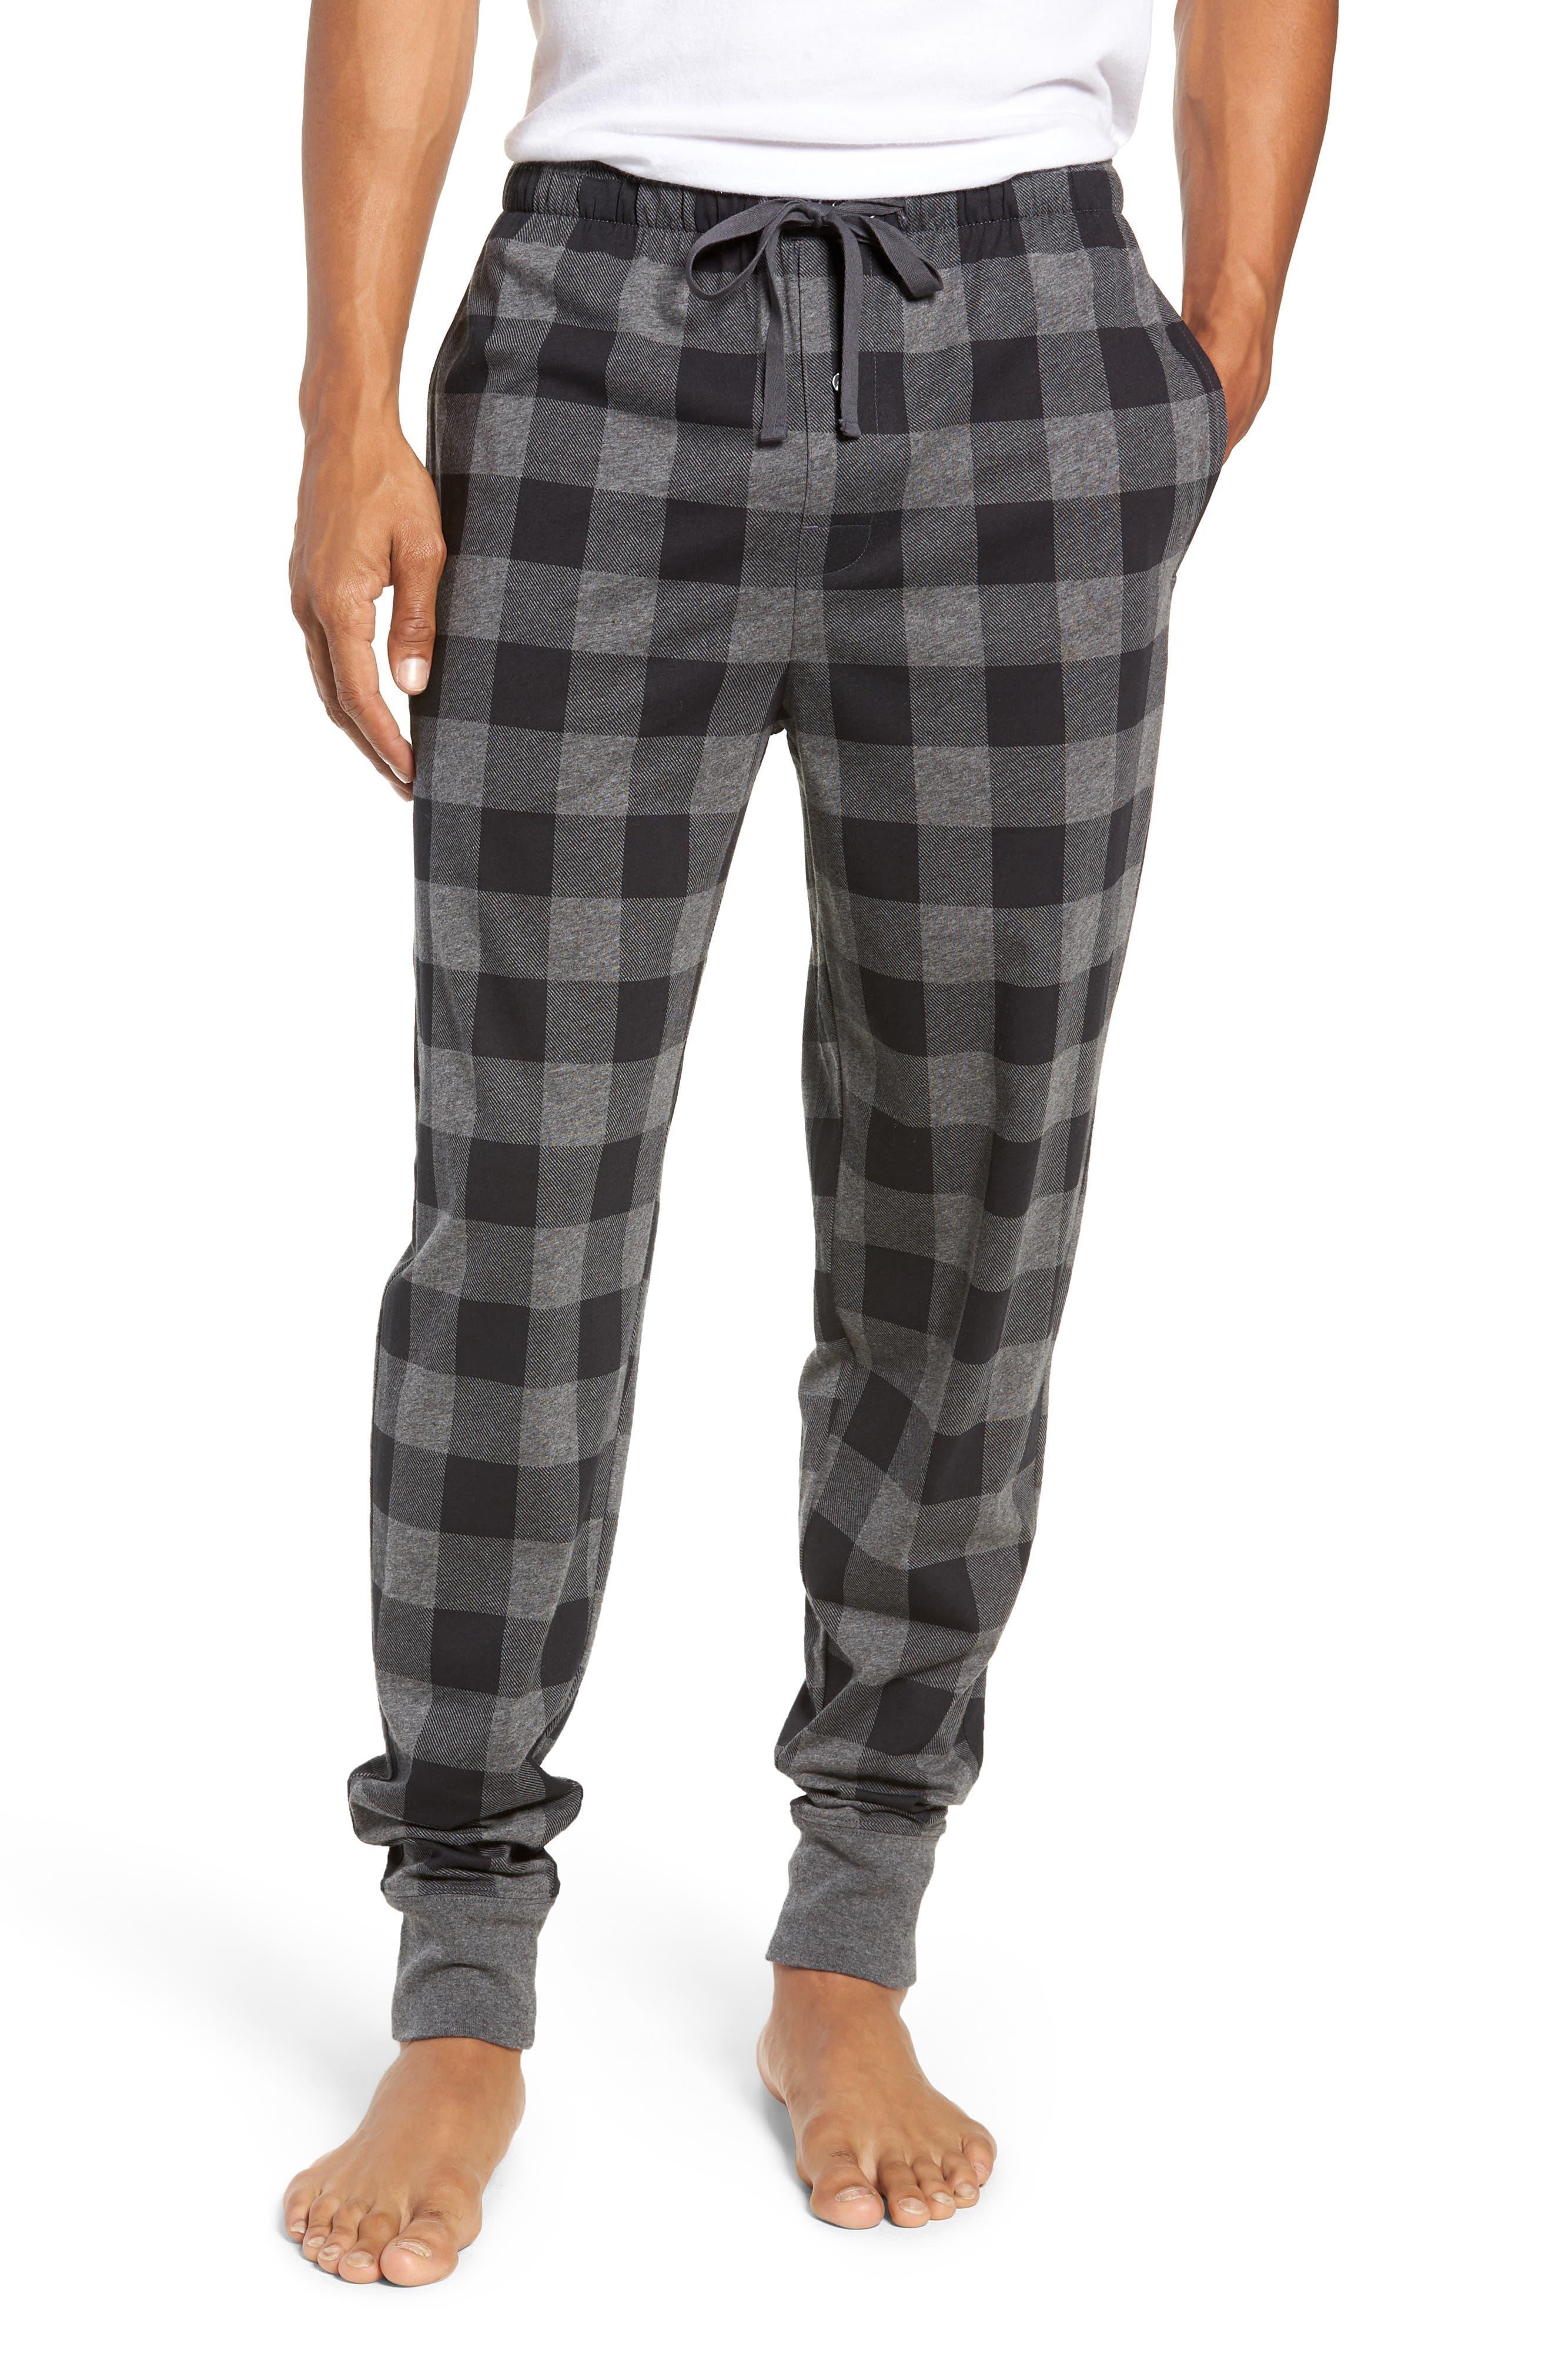 Cotton Lounge Pants,                         Main,                         color, CHARCOAL/ BUFFALO PLAID